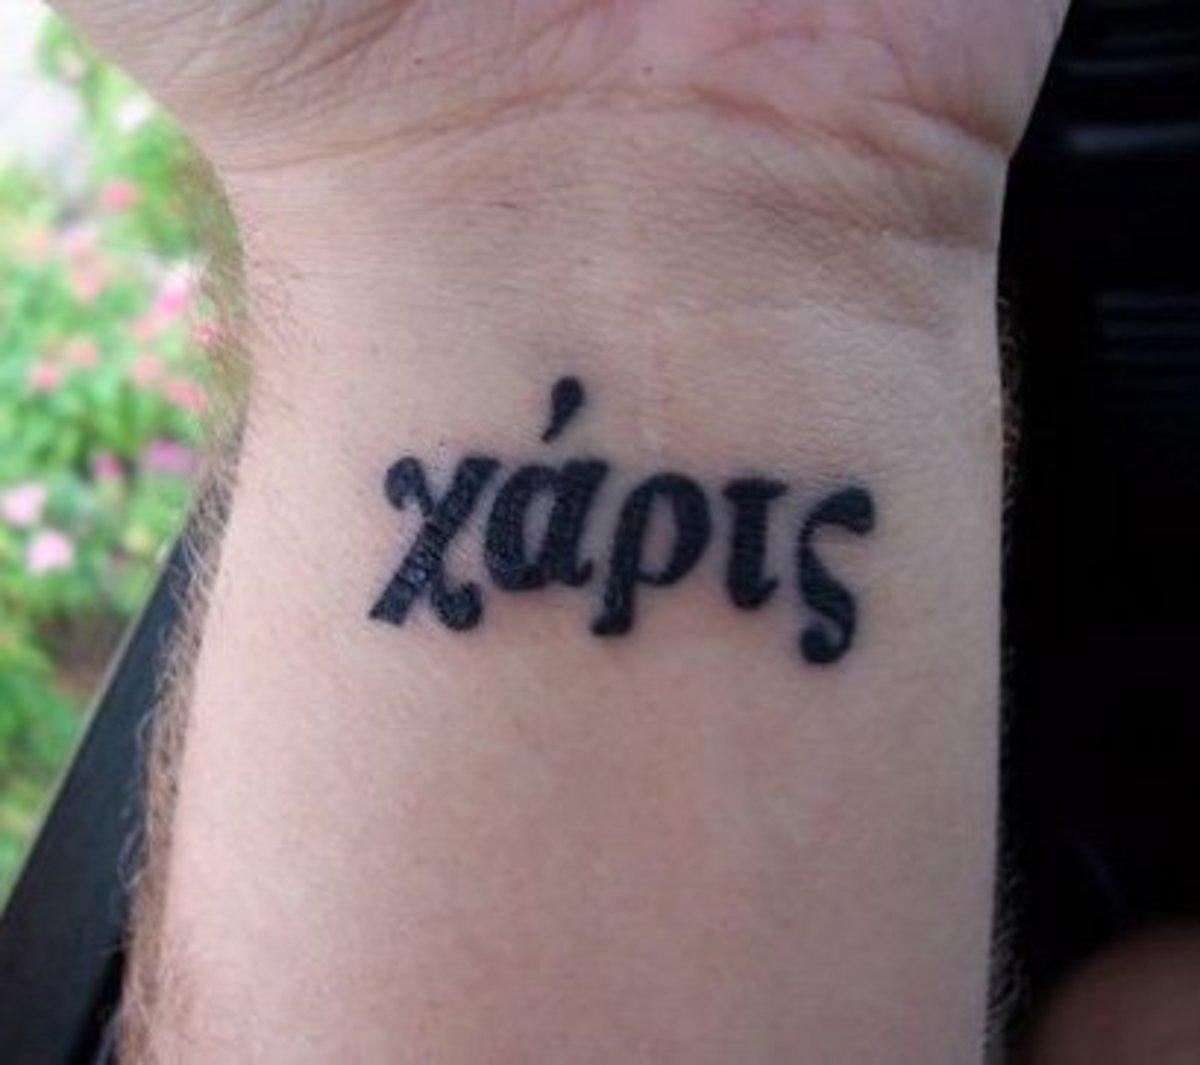 Tattoo Ideas: Greek Words & Phrases